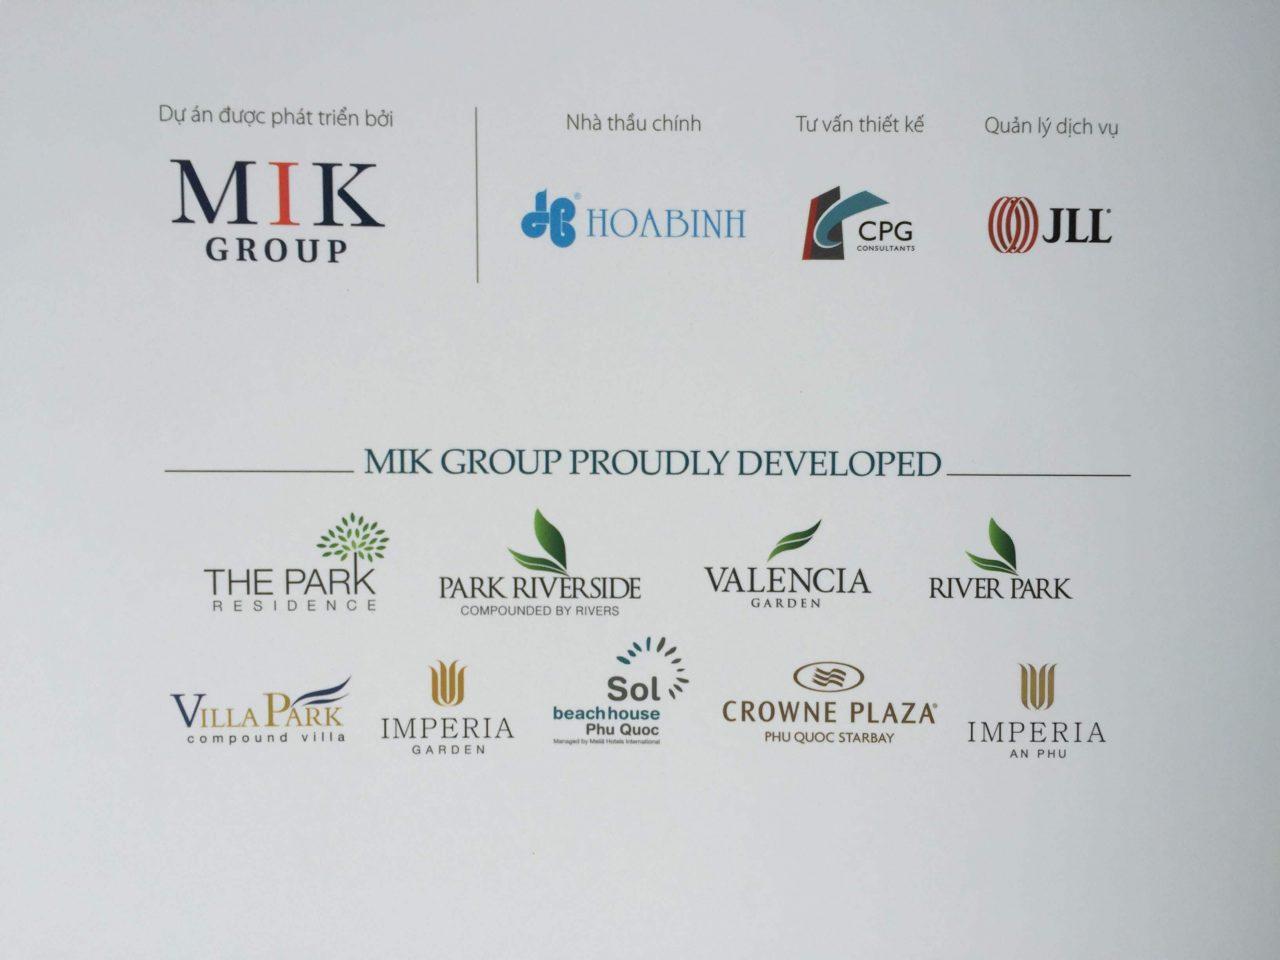 Chủ đầu tư dự án Imperia Sky Garden